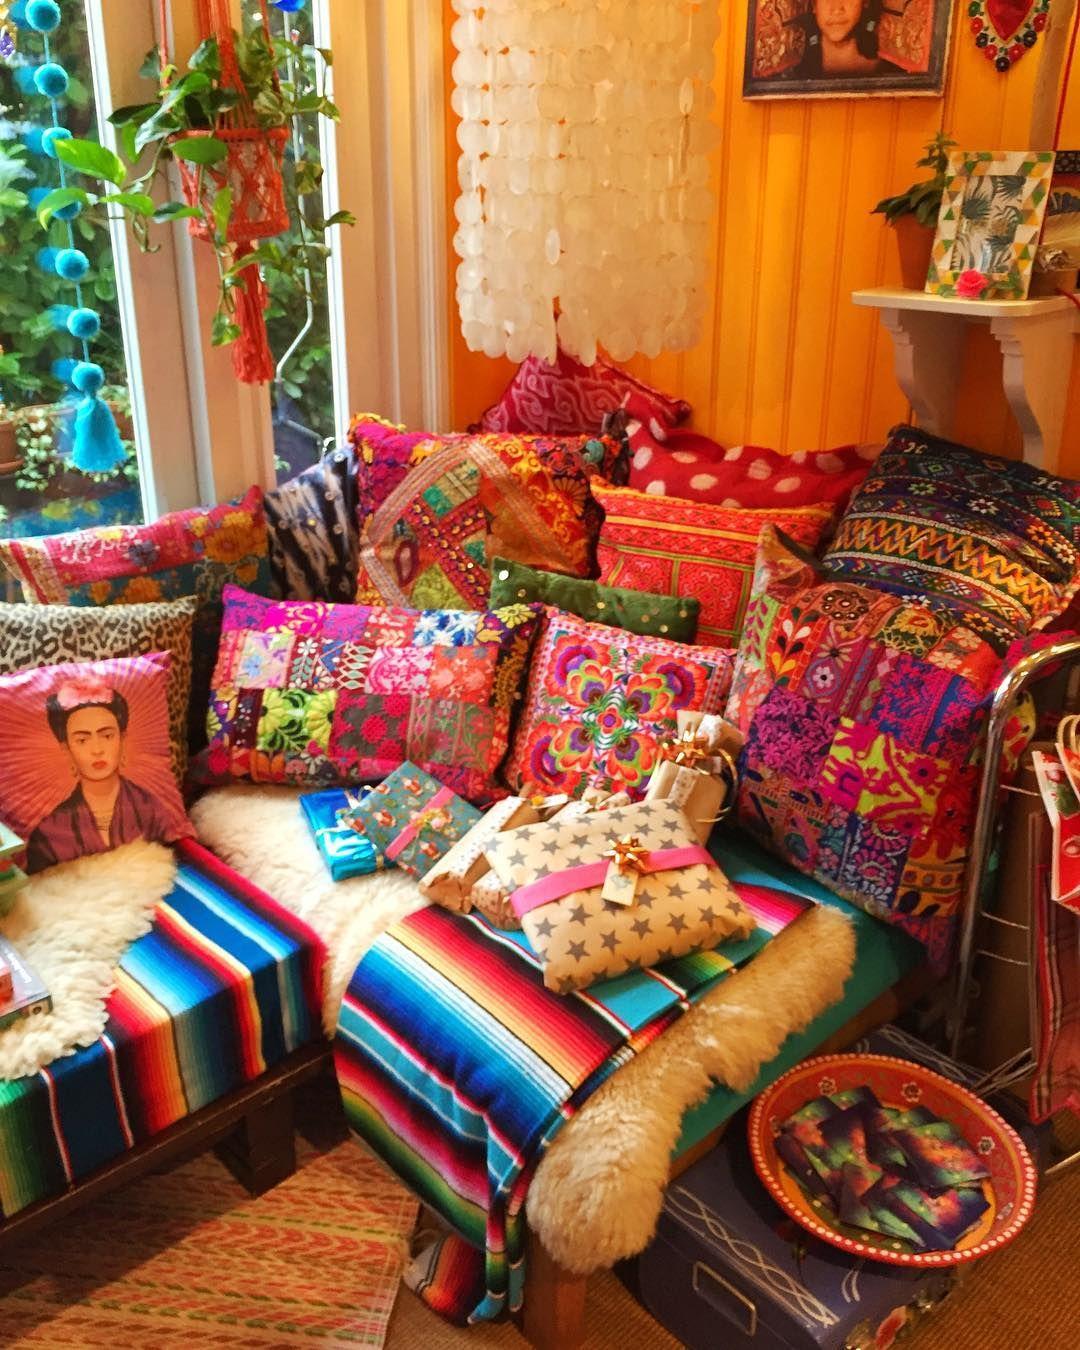 51 Inspiring Bohemian Living Room Designs: Amazing Bohemian Style Decors To Inspire Your Inner Boho